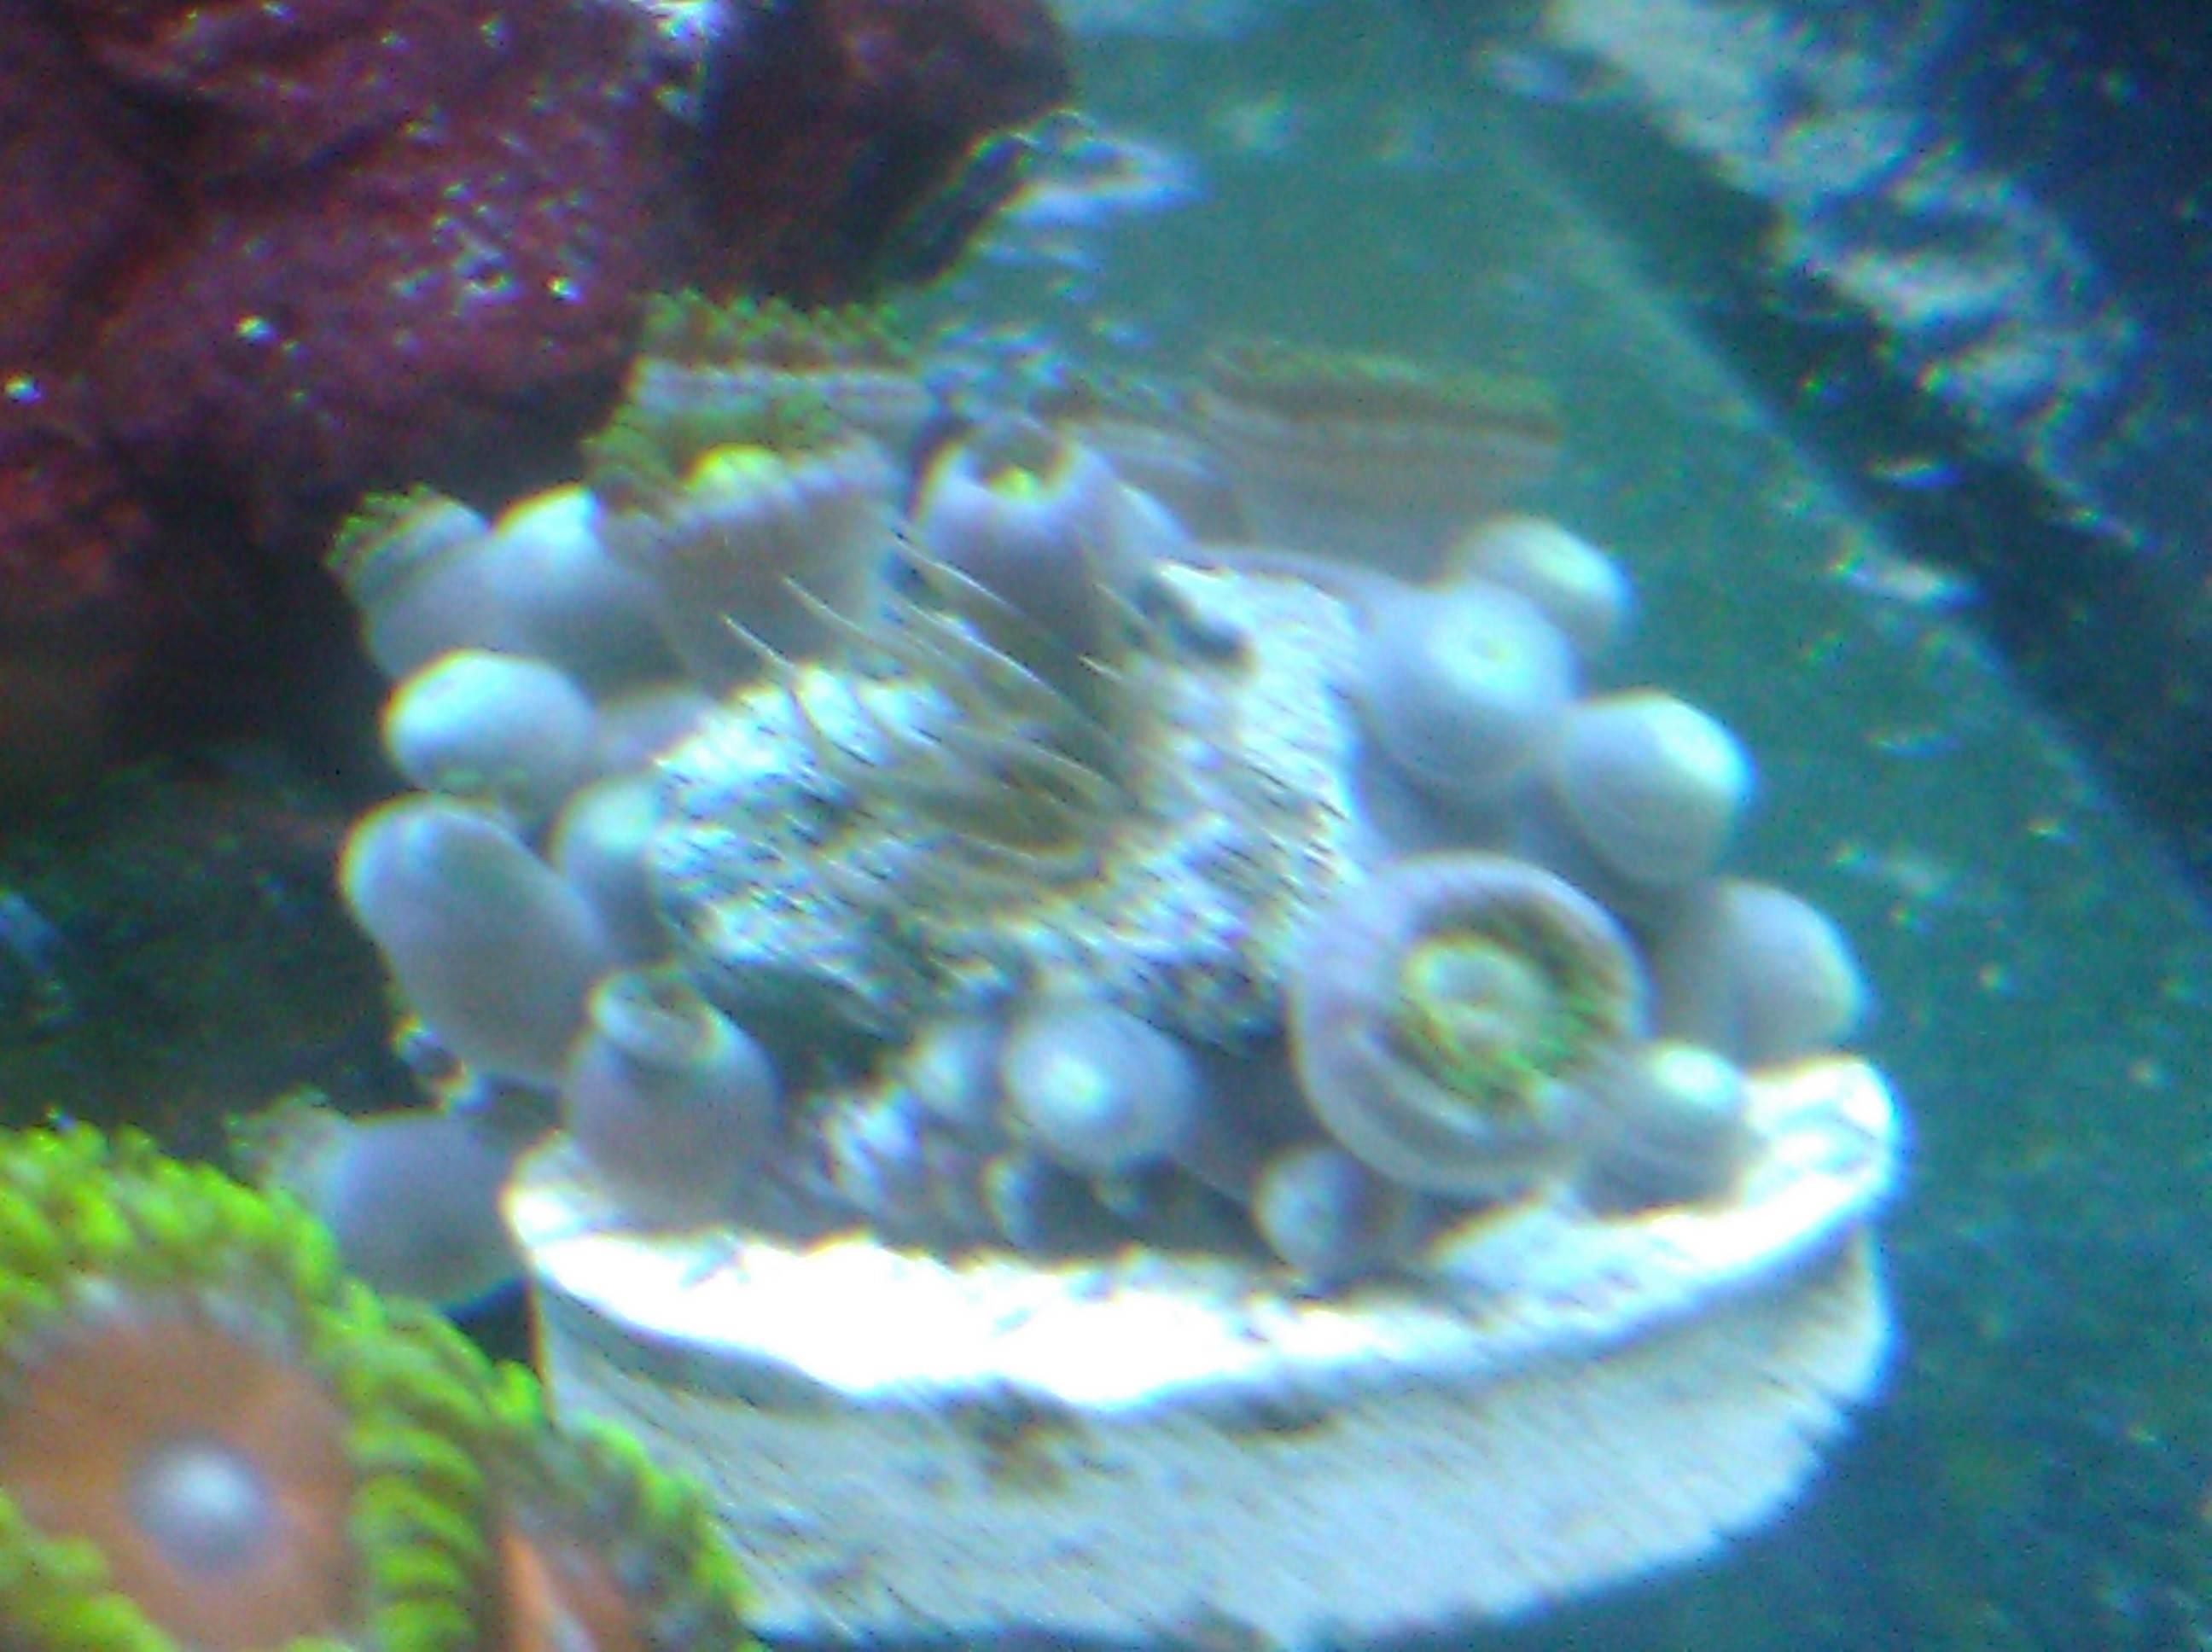 how to kill aiptasia hiding in small hole in frag algae disease